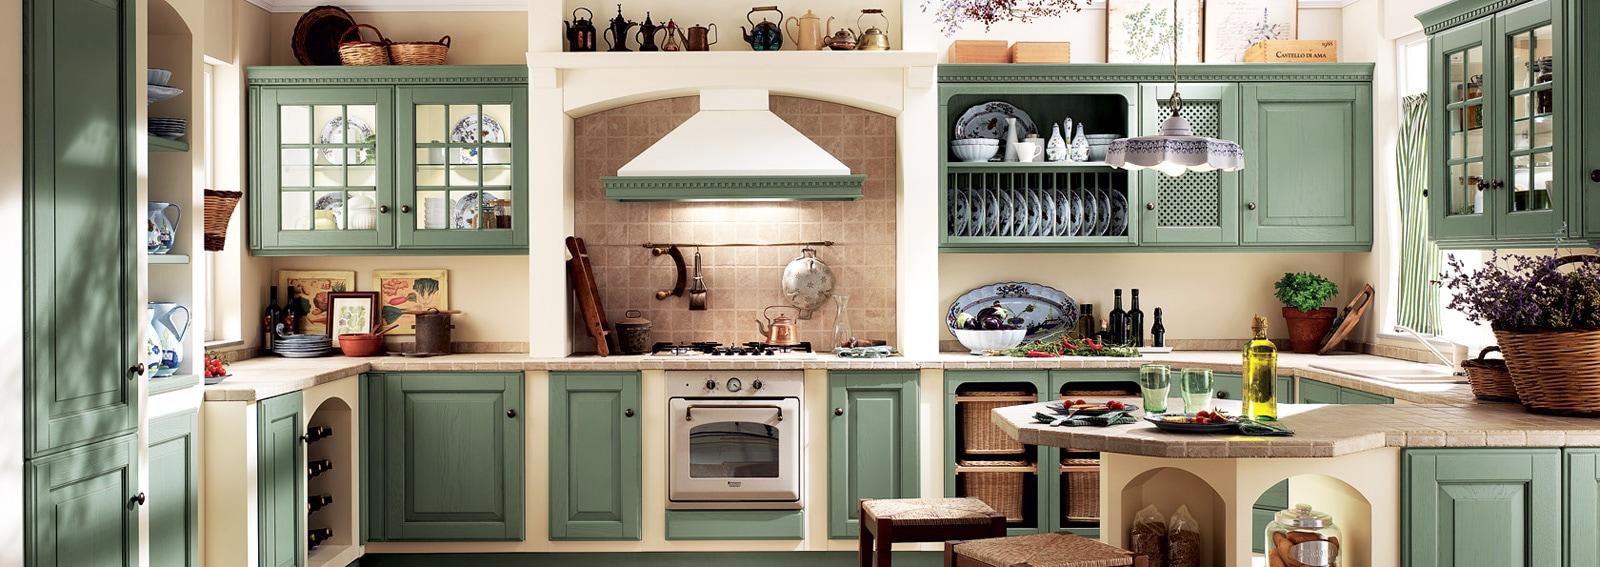 Cucine in muratura: classiche, rustiche e country - Grazia